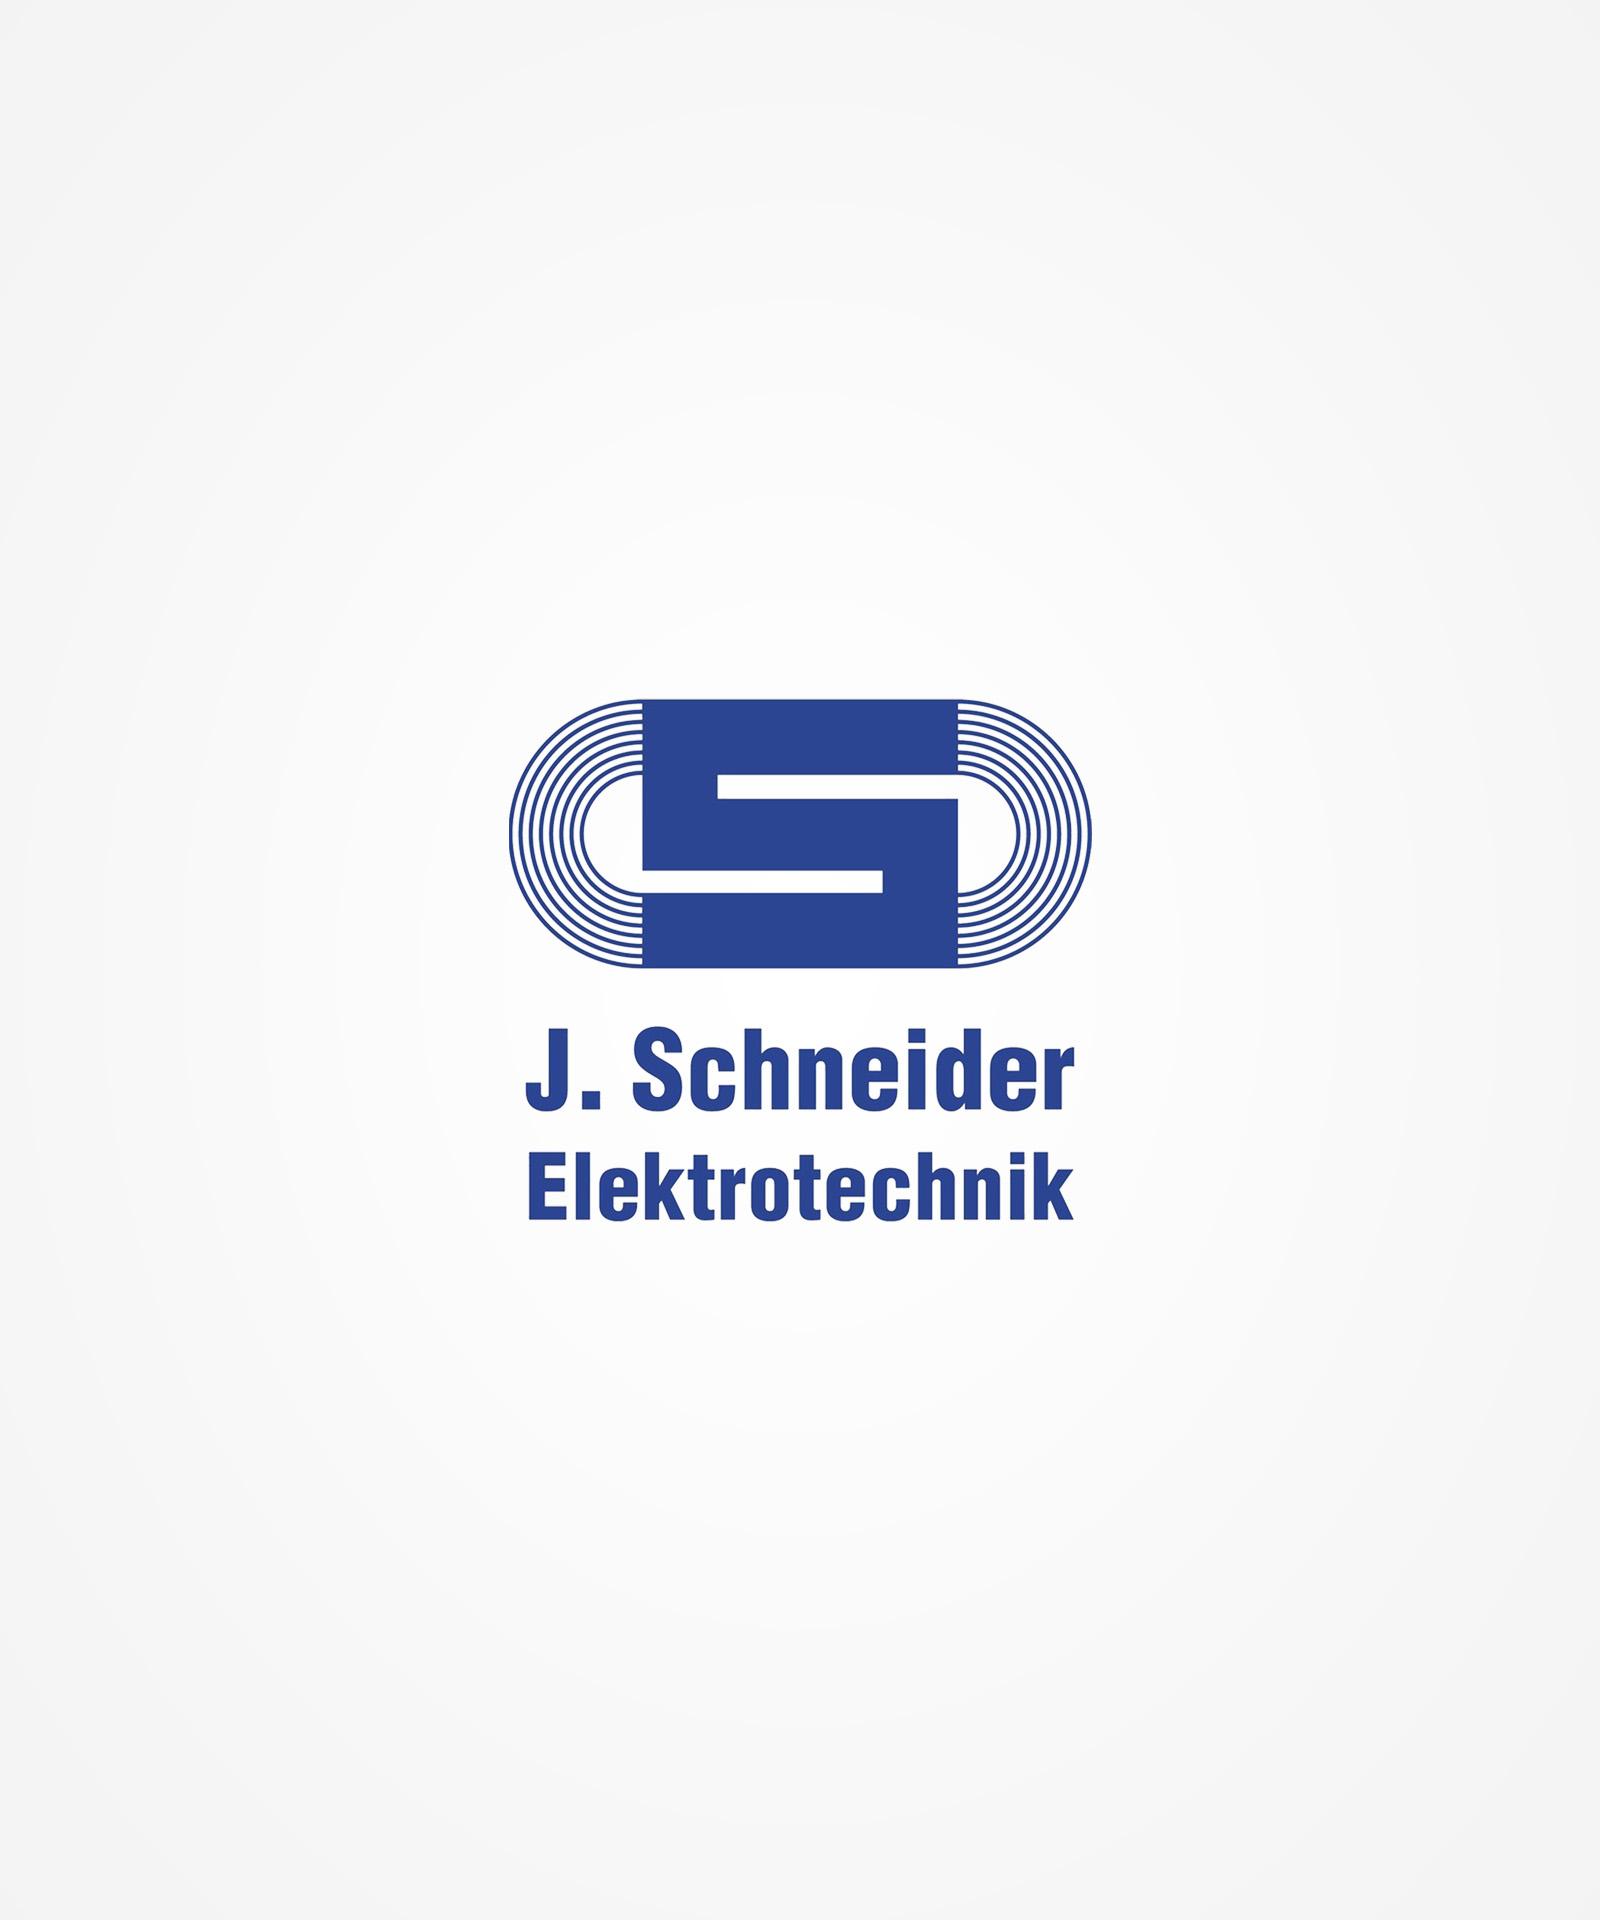 J Schneider Elektrotechnik